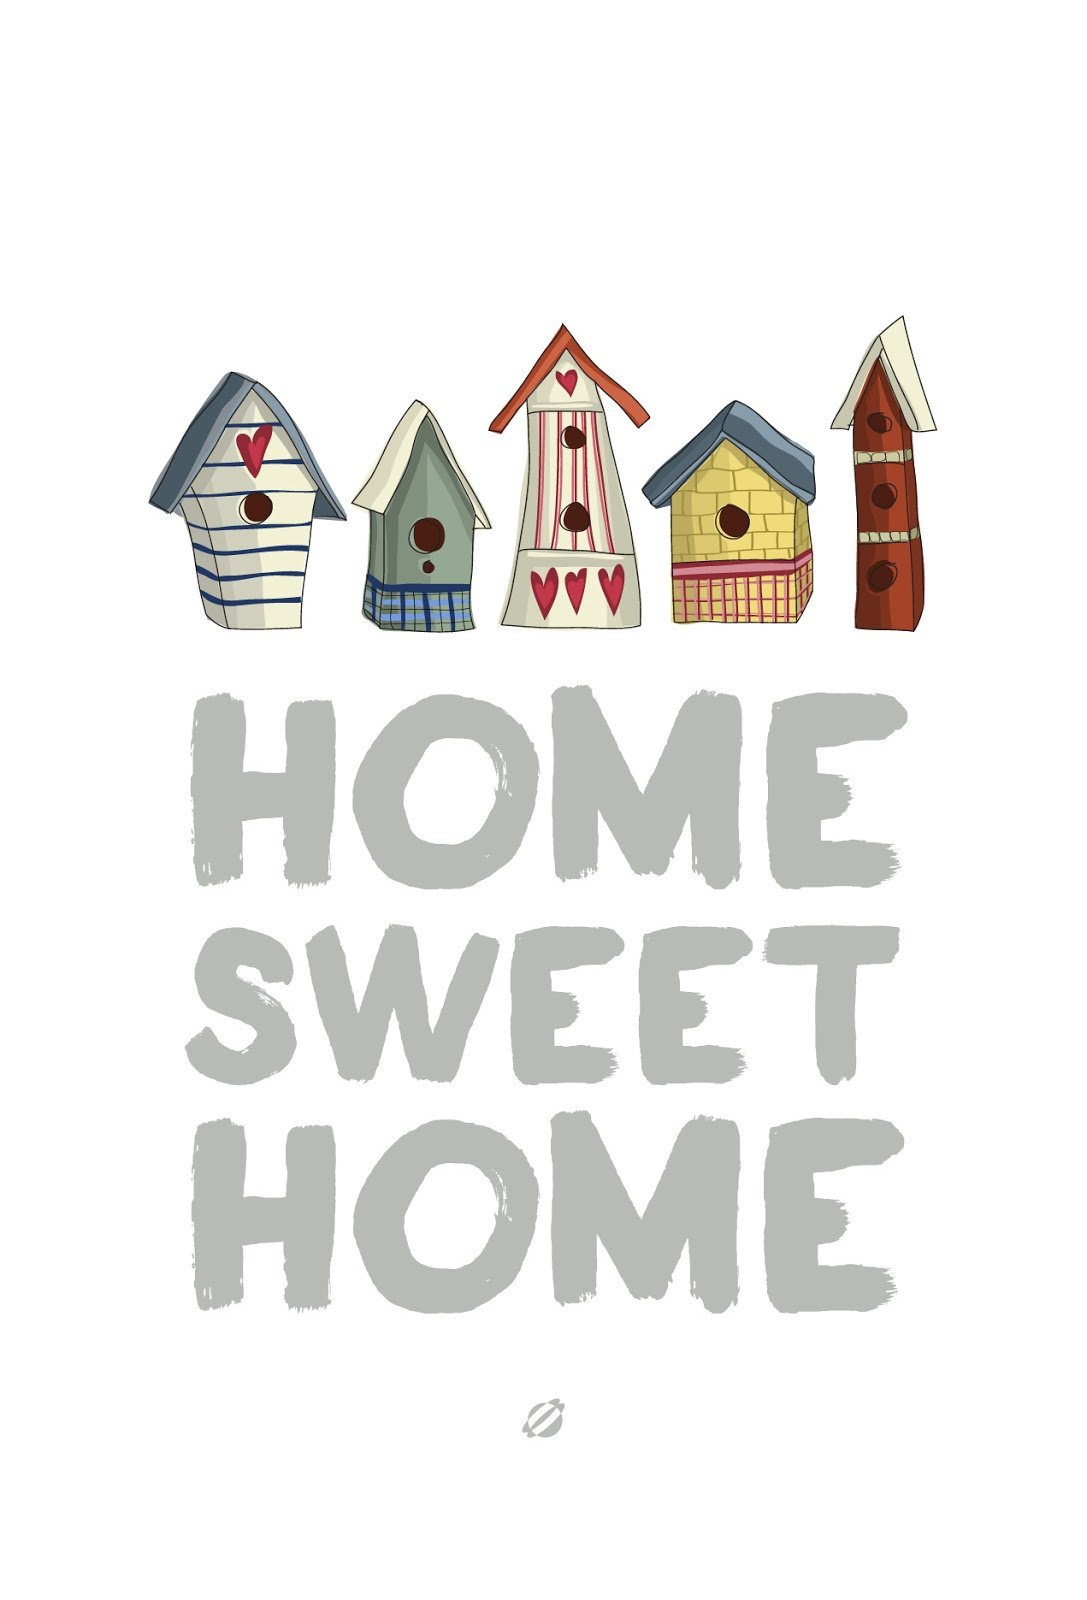 lostbumblebee home sweet home. Black Bedroom Furniture Sets. Home Design Ideas